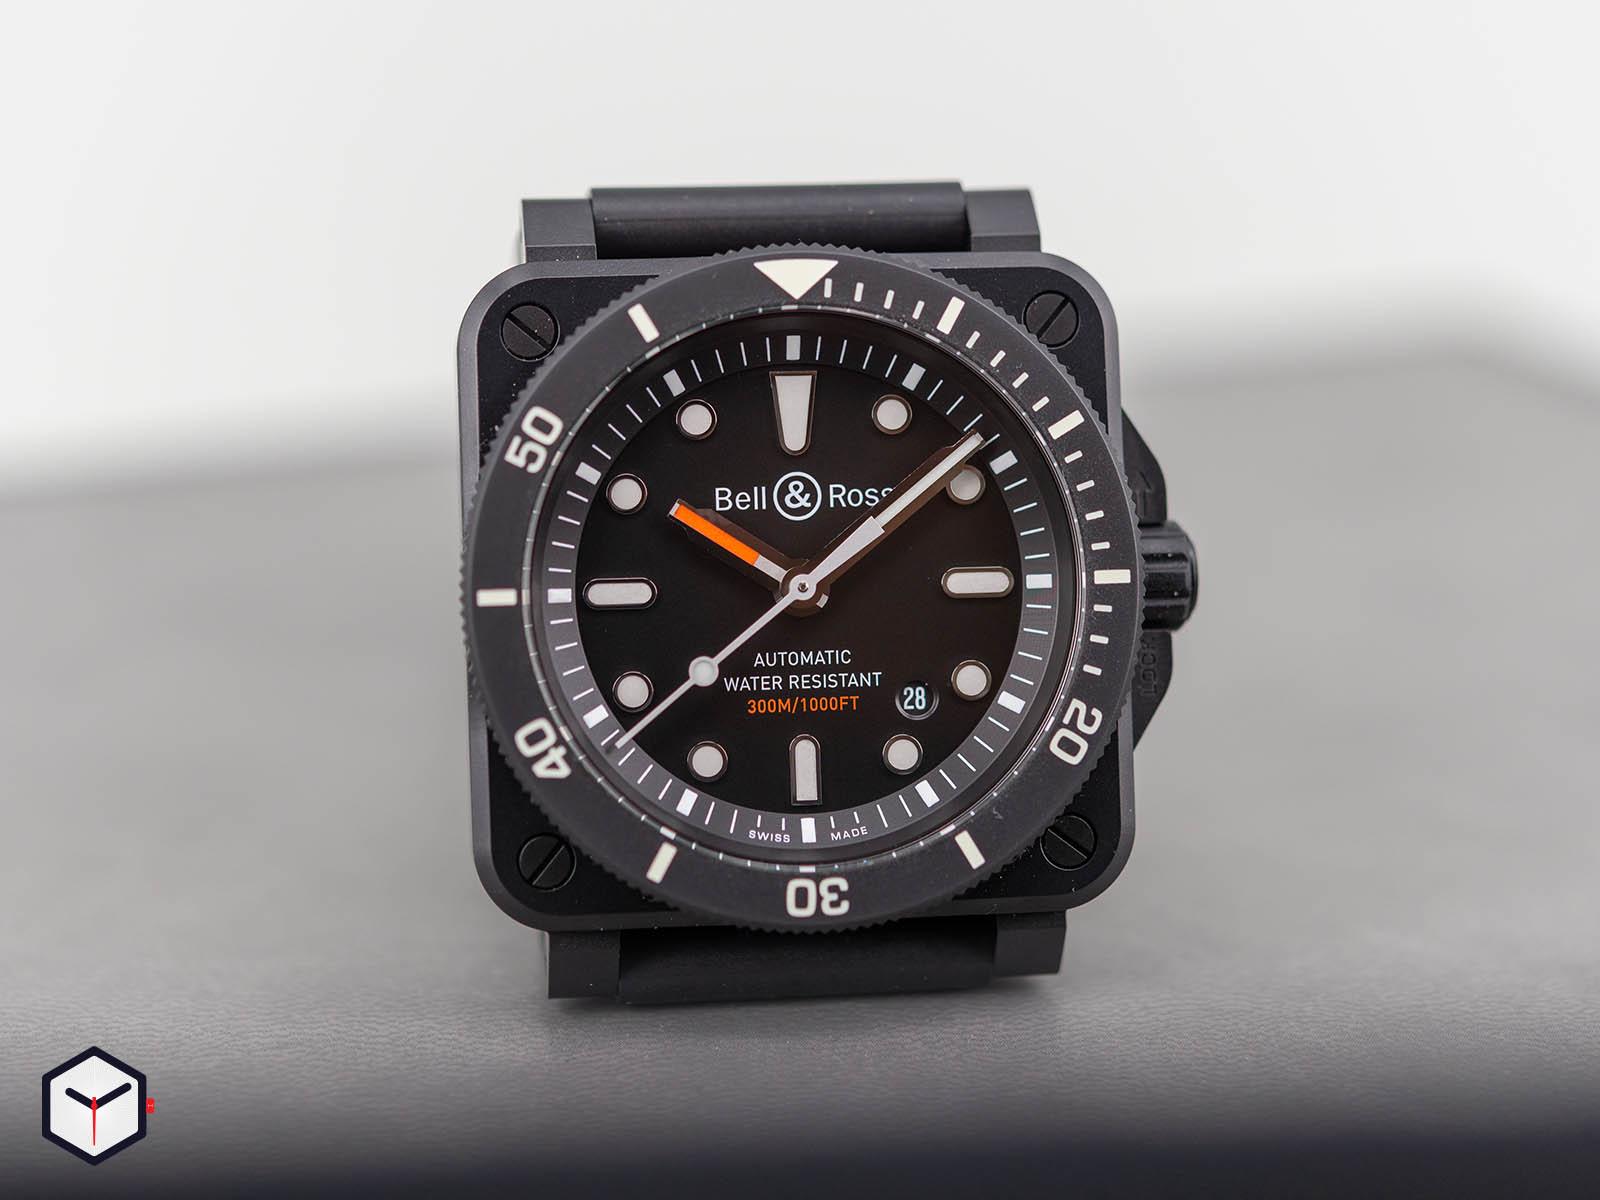 br0392-d-bl-ce-srb-bell-ross-br-03-92-diver-black-matte-2.jpg